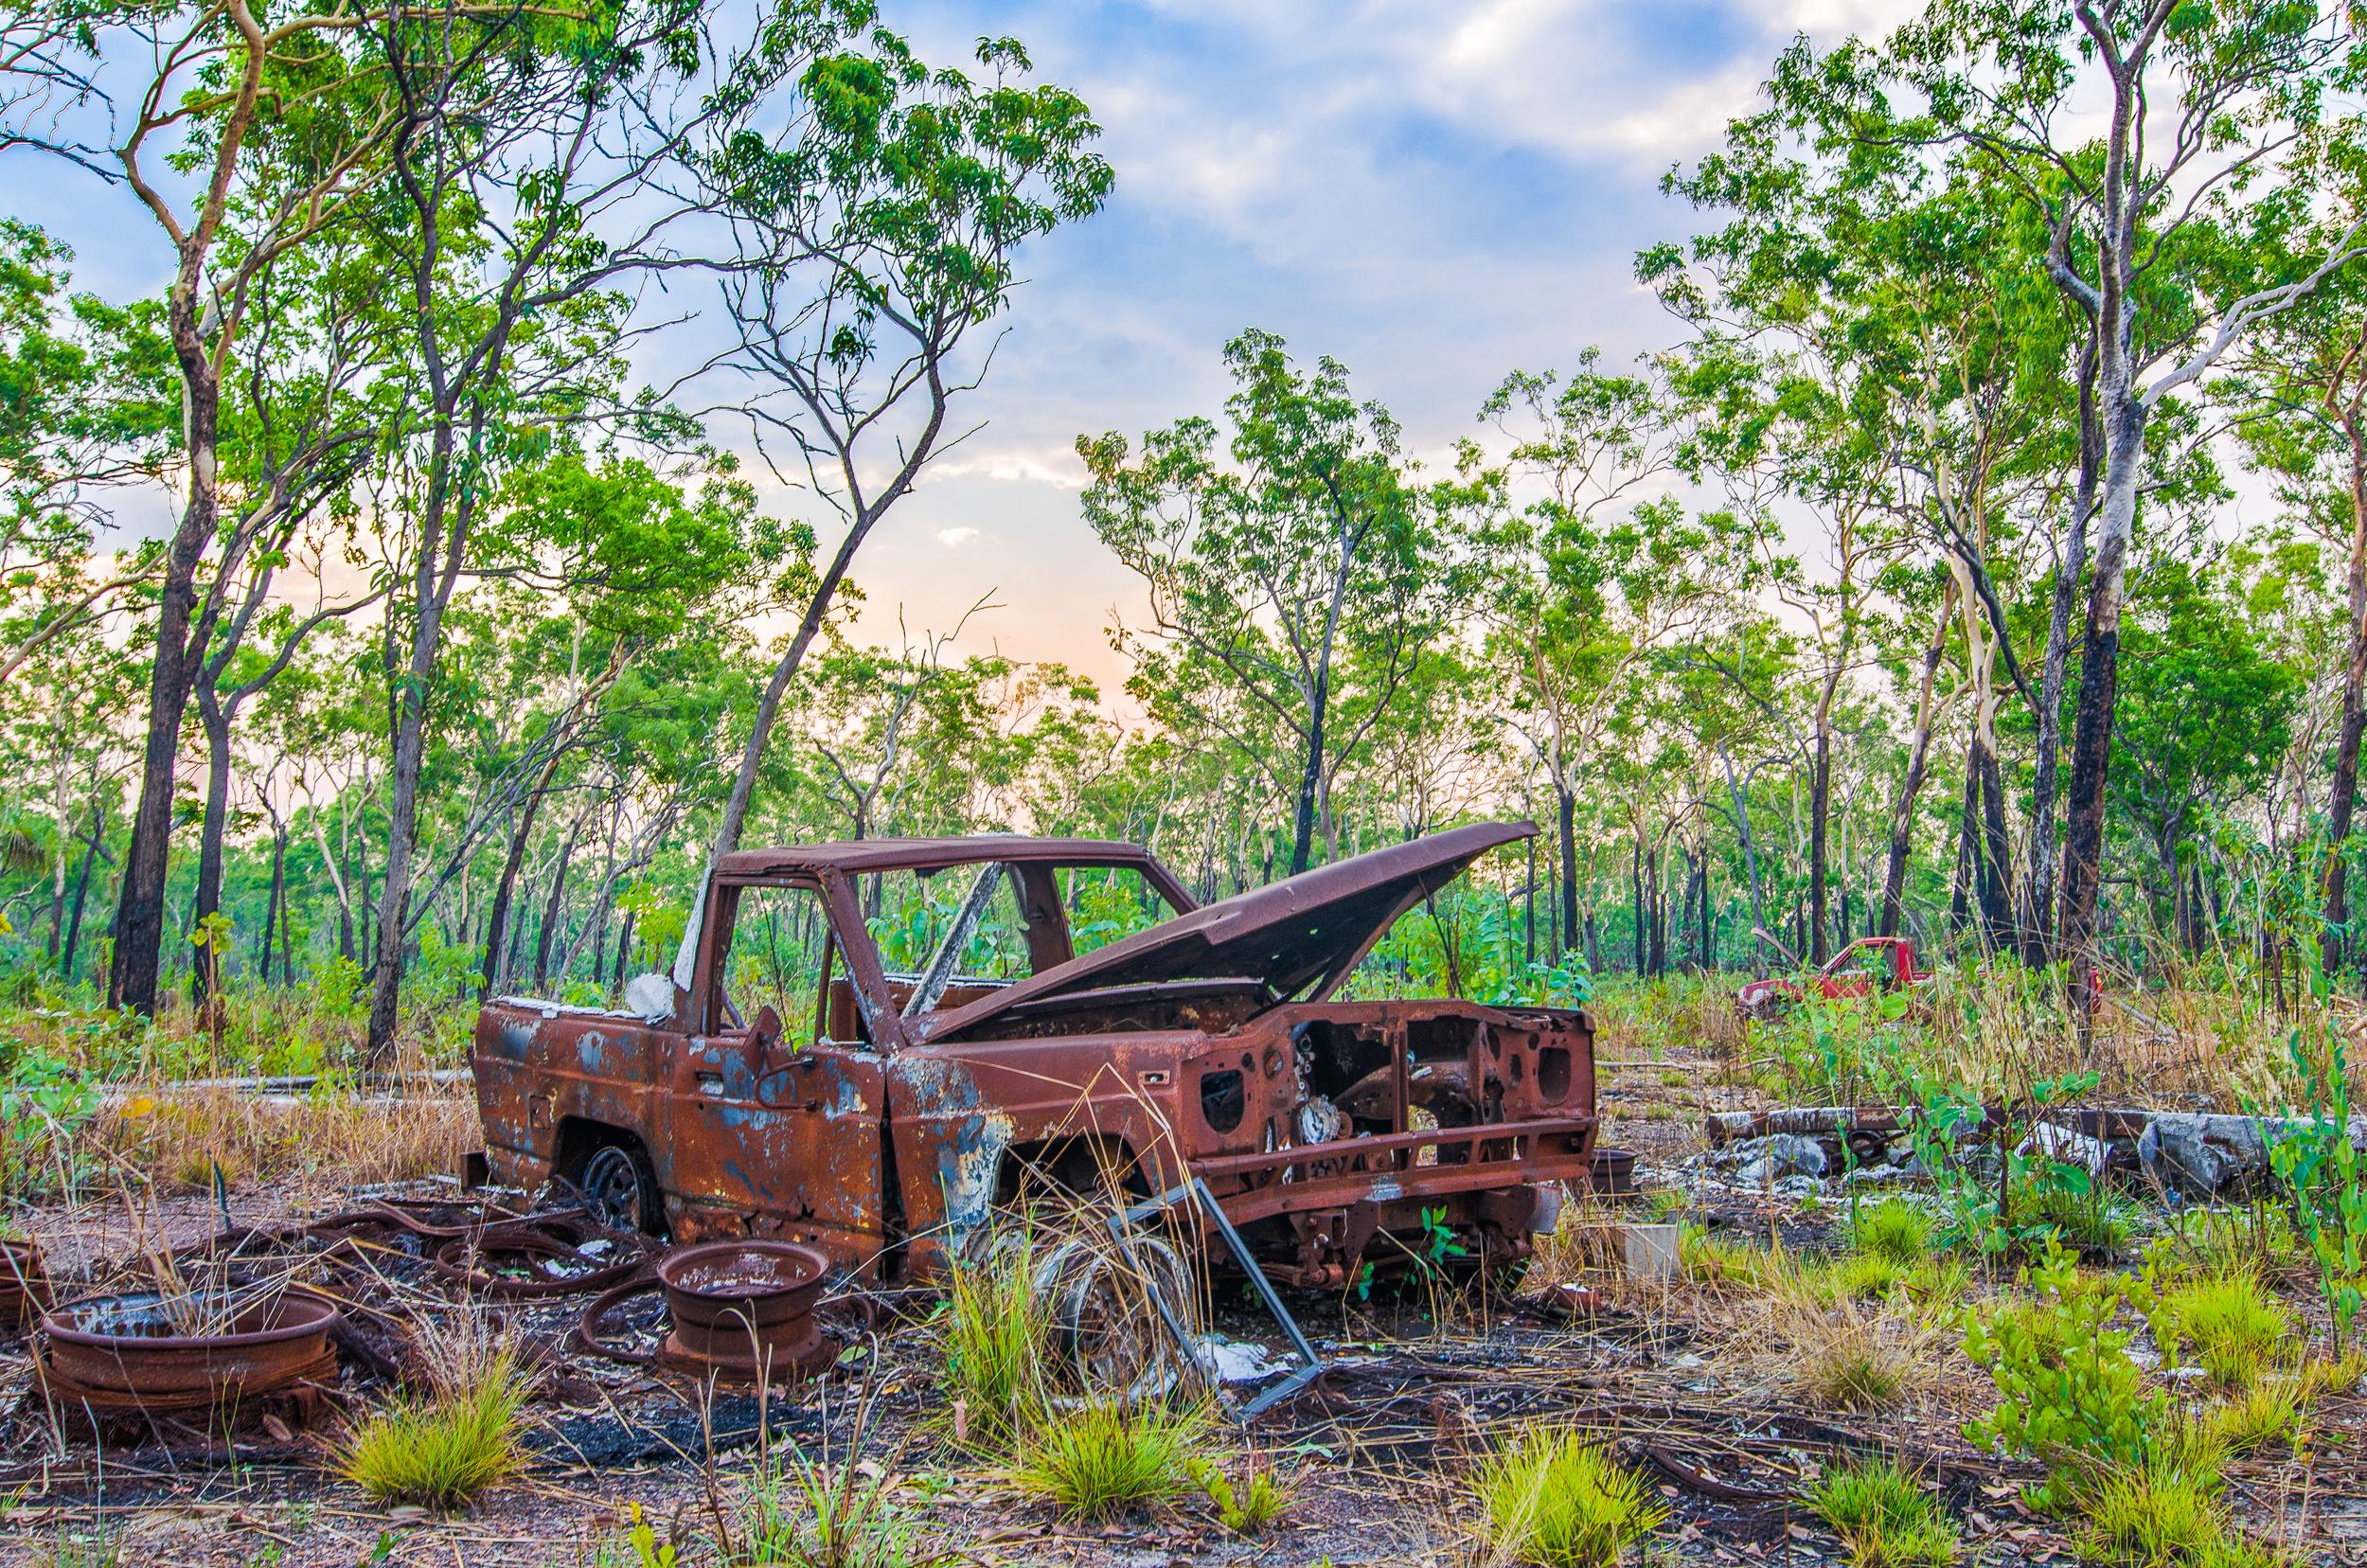 truck cemetery litchfield road trip darwin-cairns